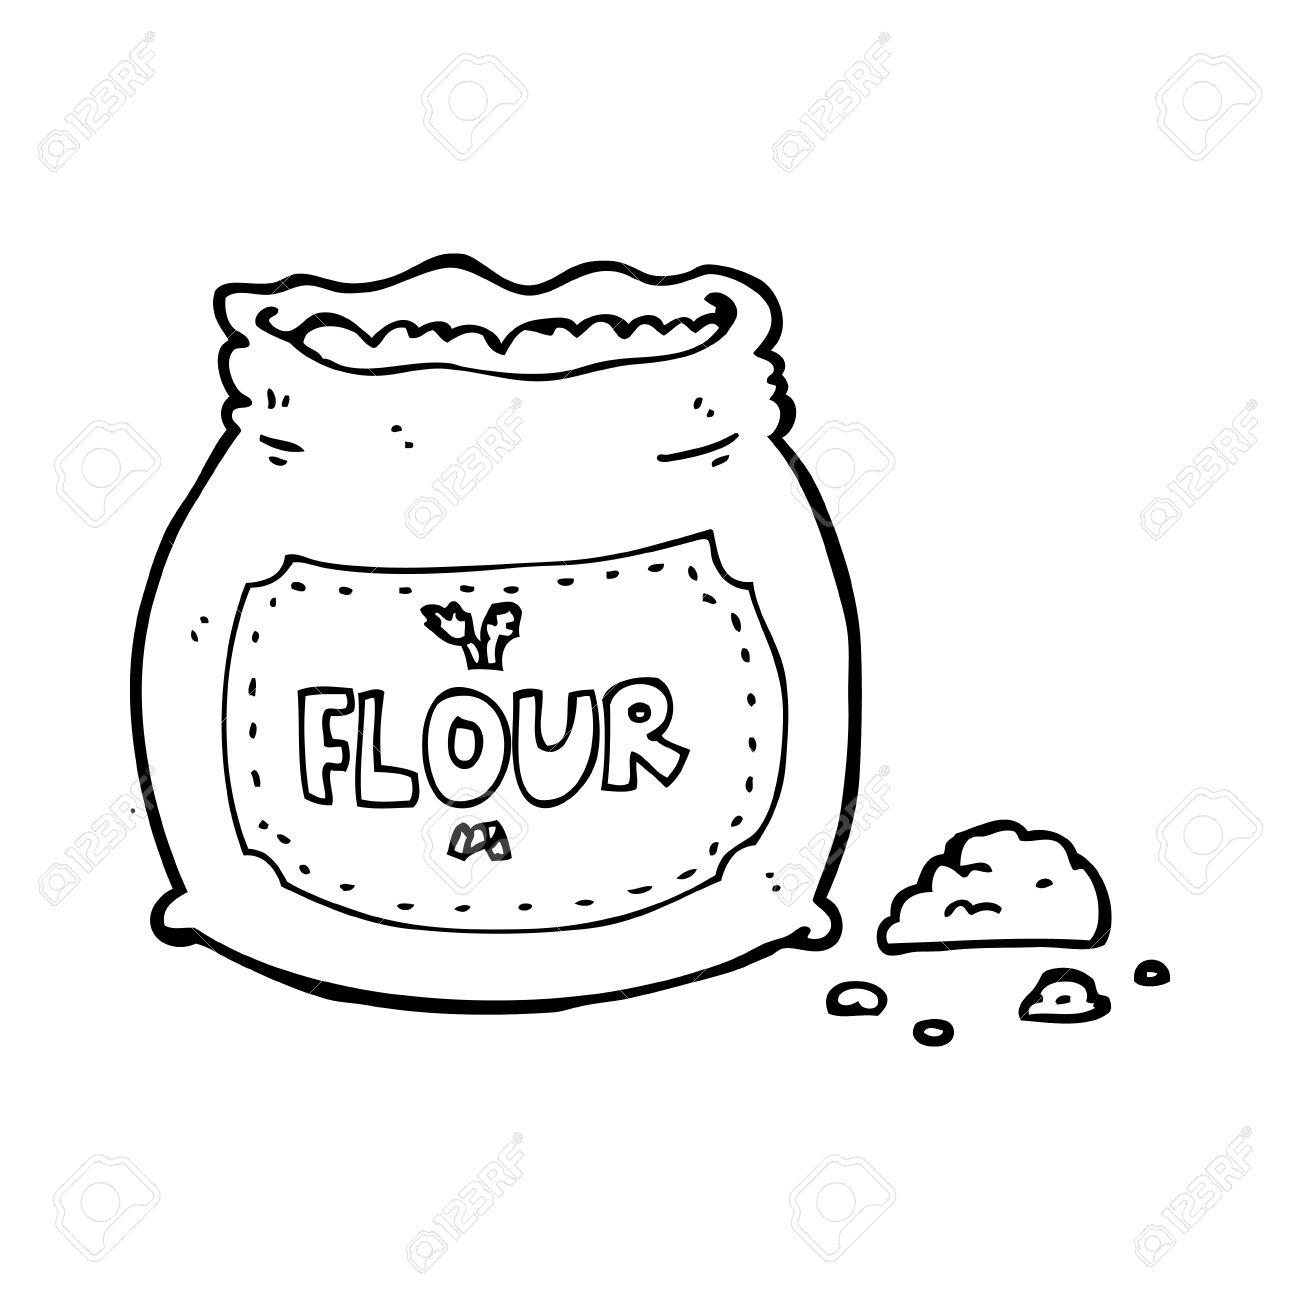 Flour Bag Clipart.